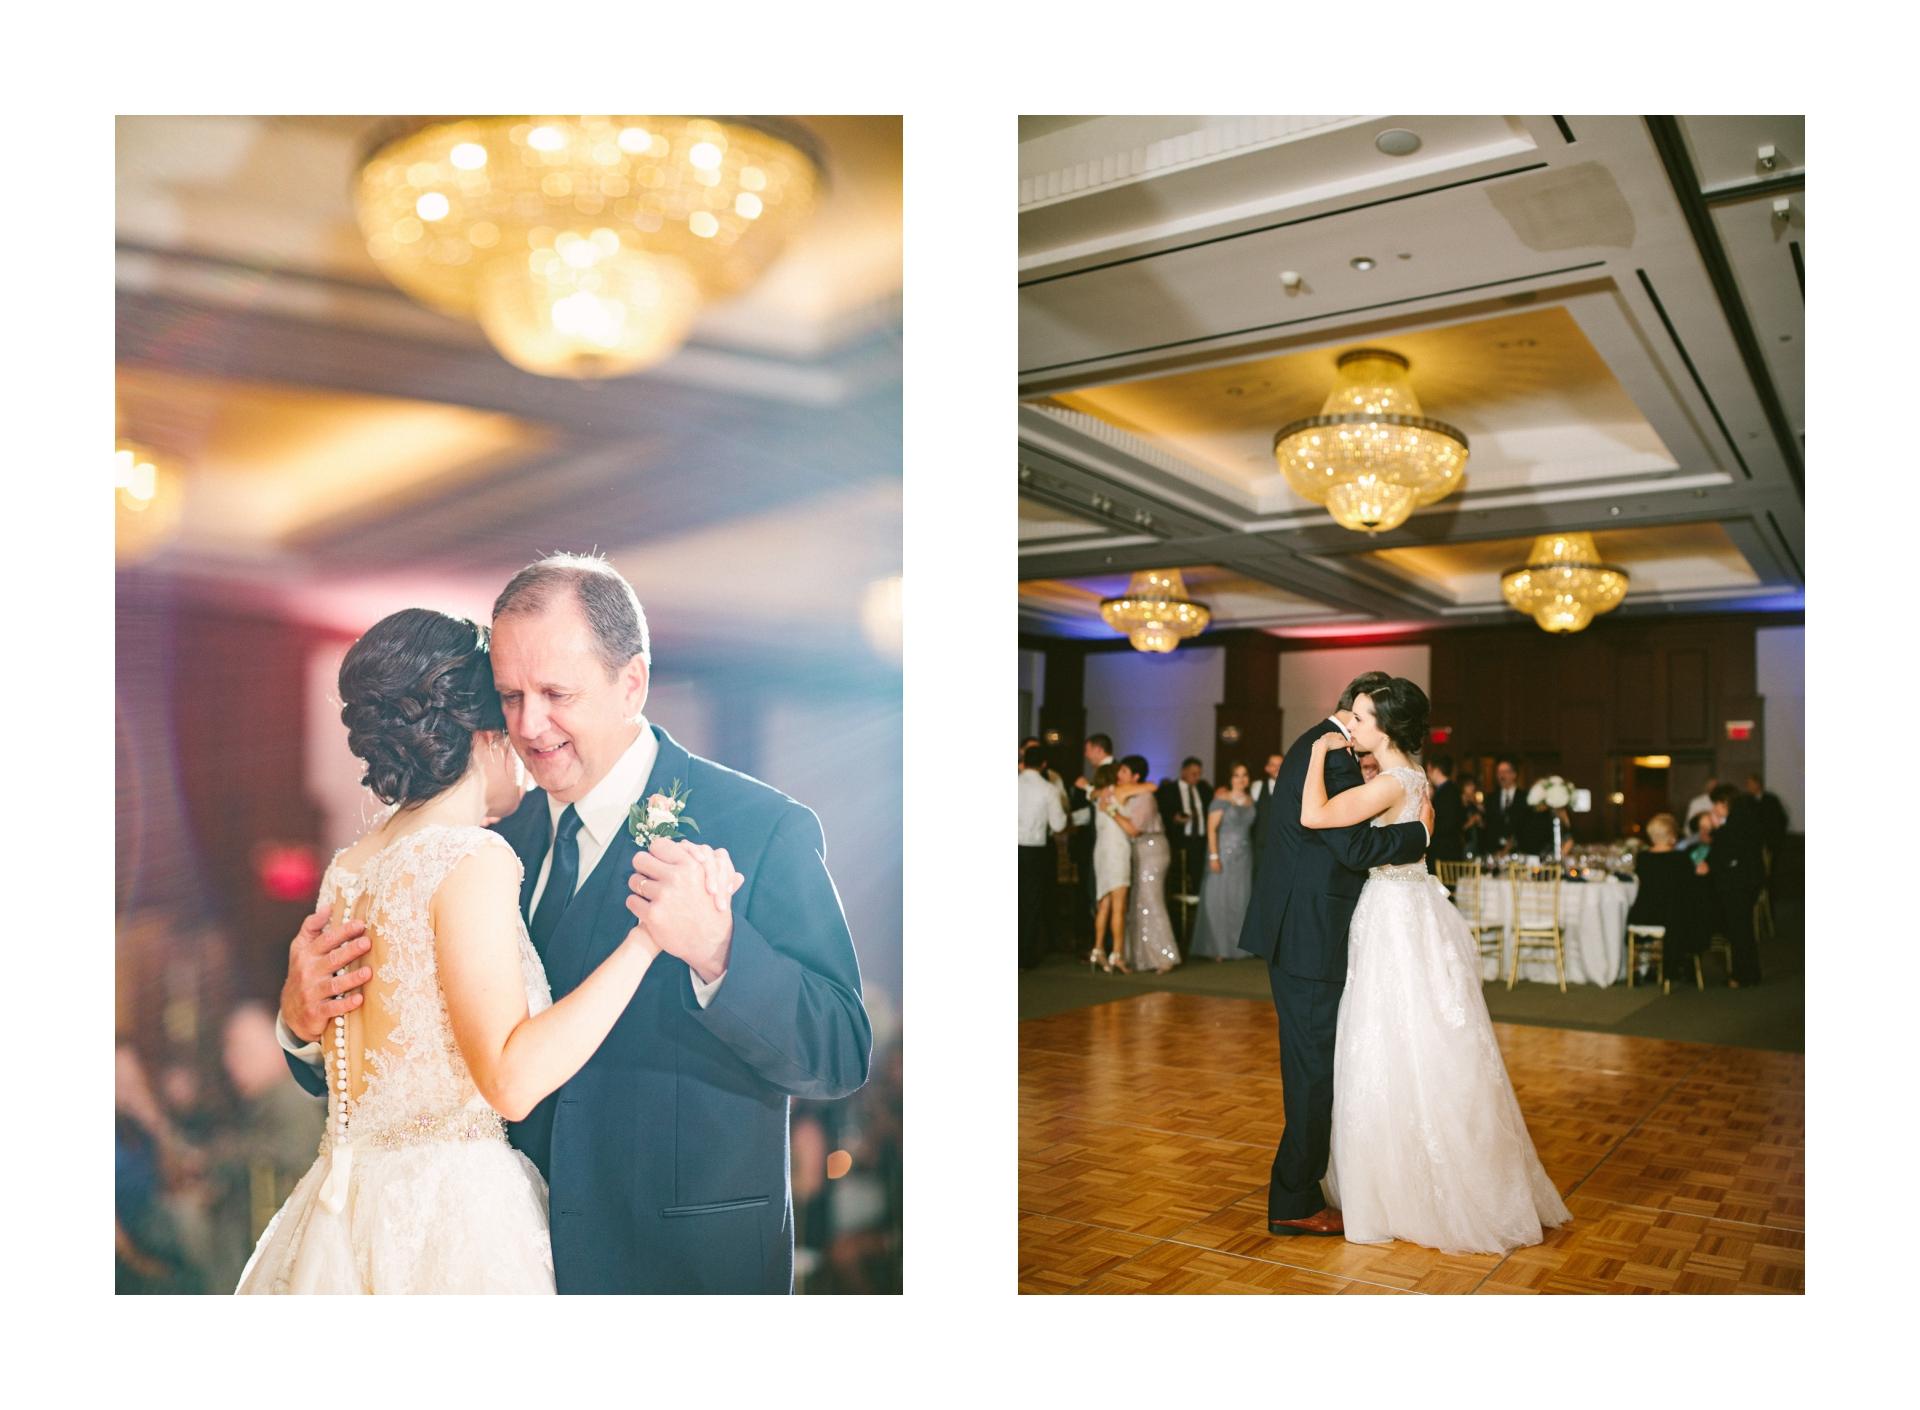 Intercontinental Hotel Wedding in Cleveland 2 40.jpg